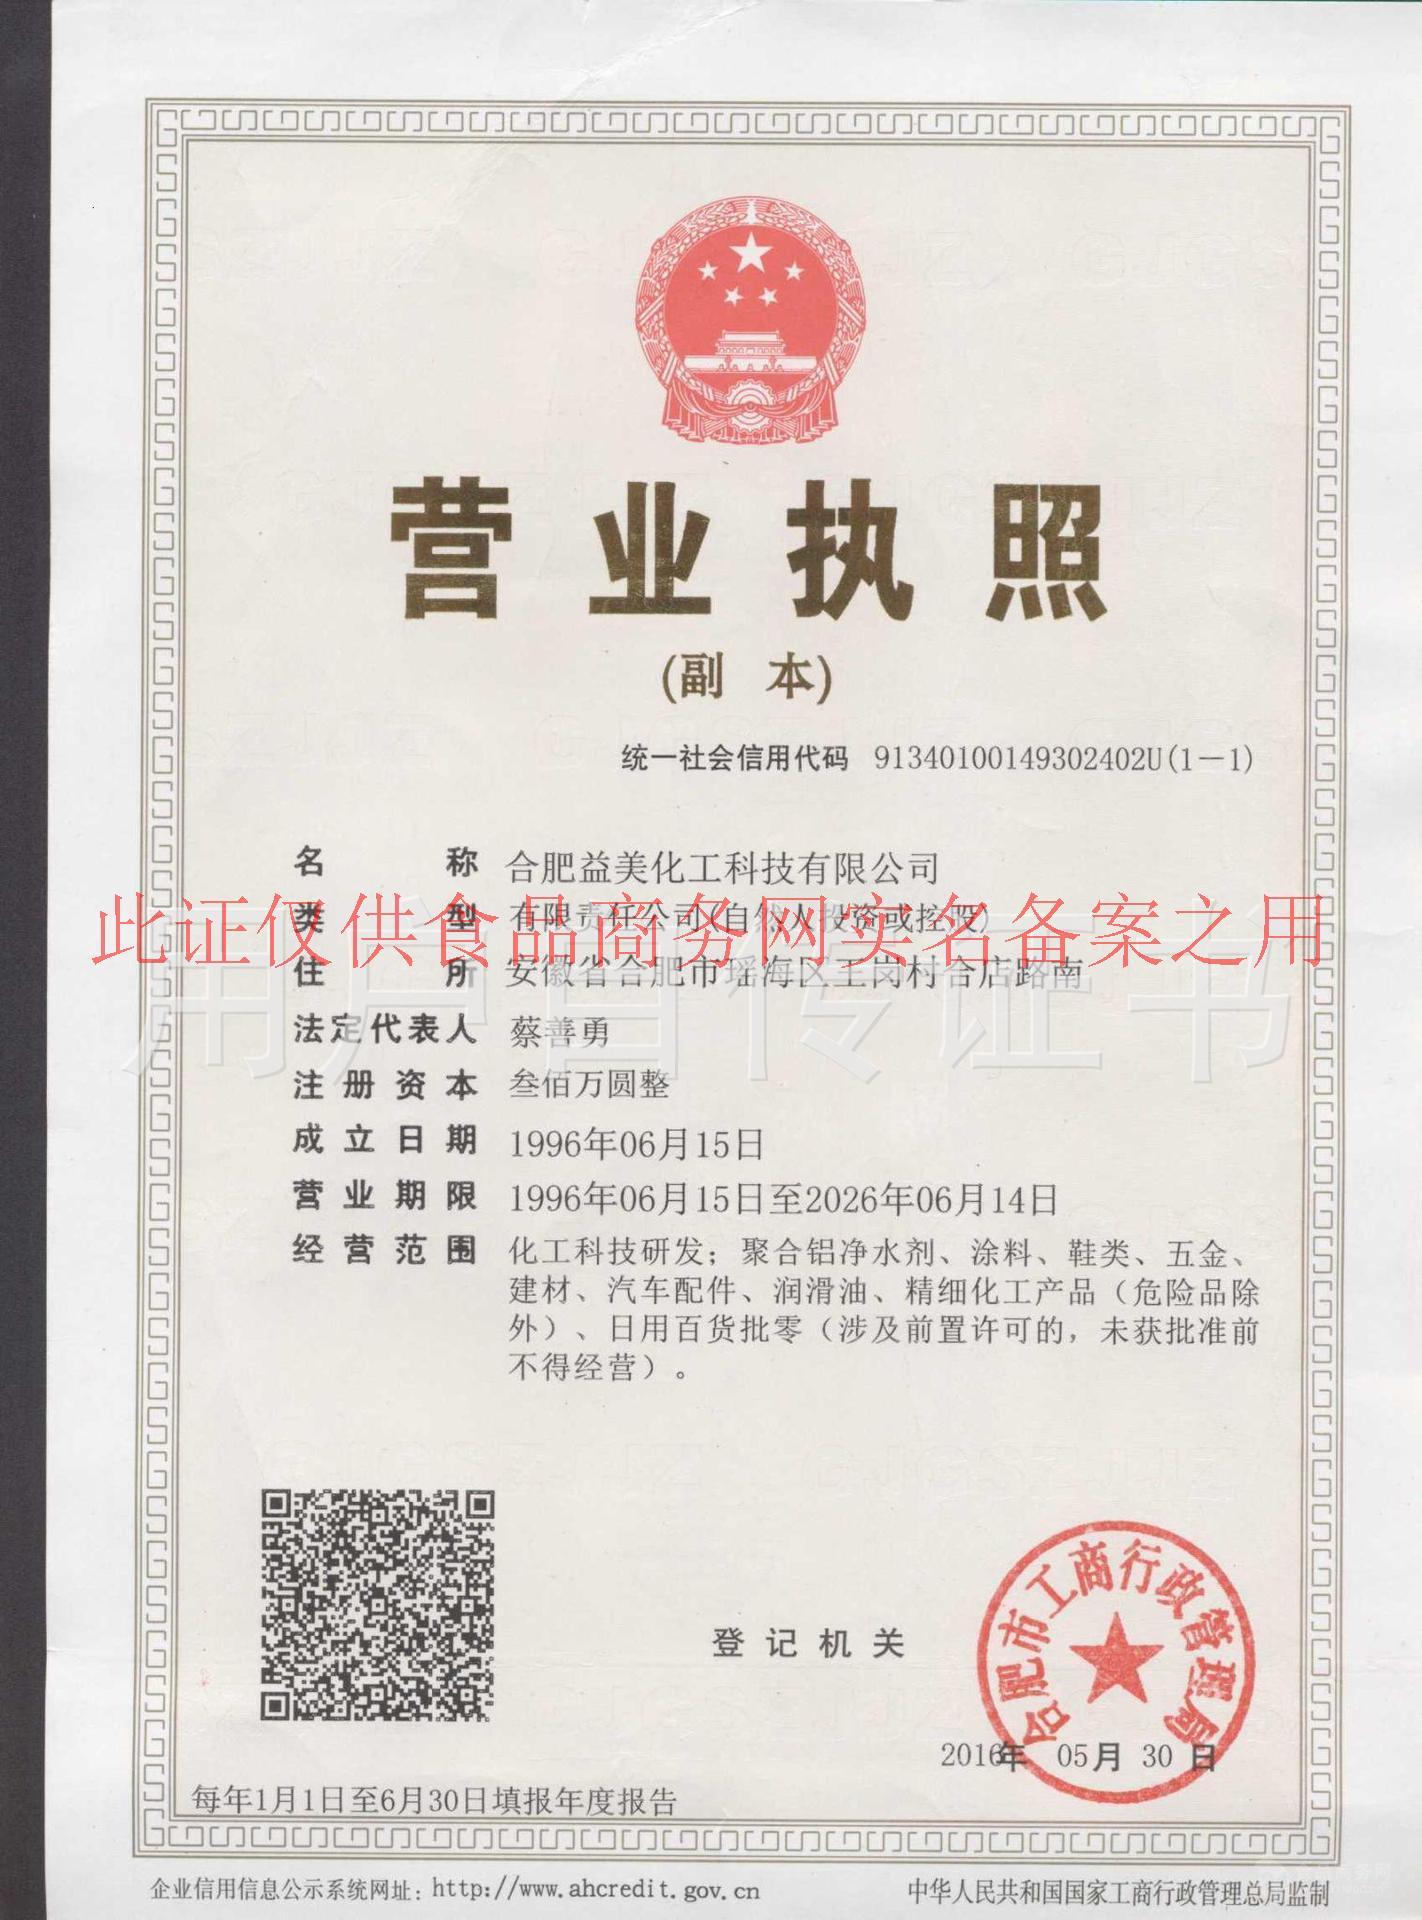 u 法定代表人: 蔡善勇  登记机关: 合肥市瑶海区市场监督管理局  企业